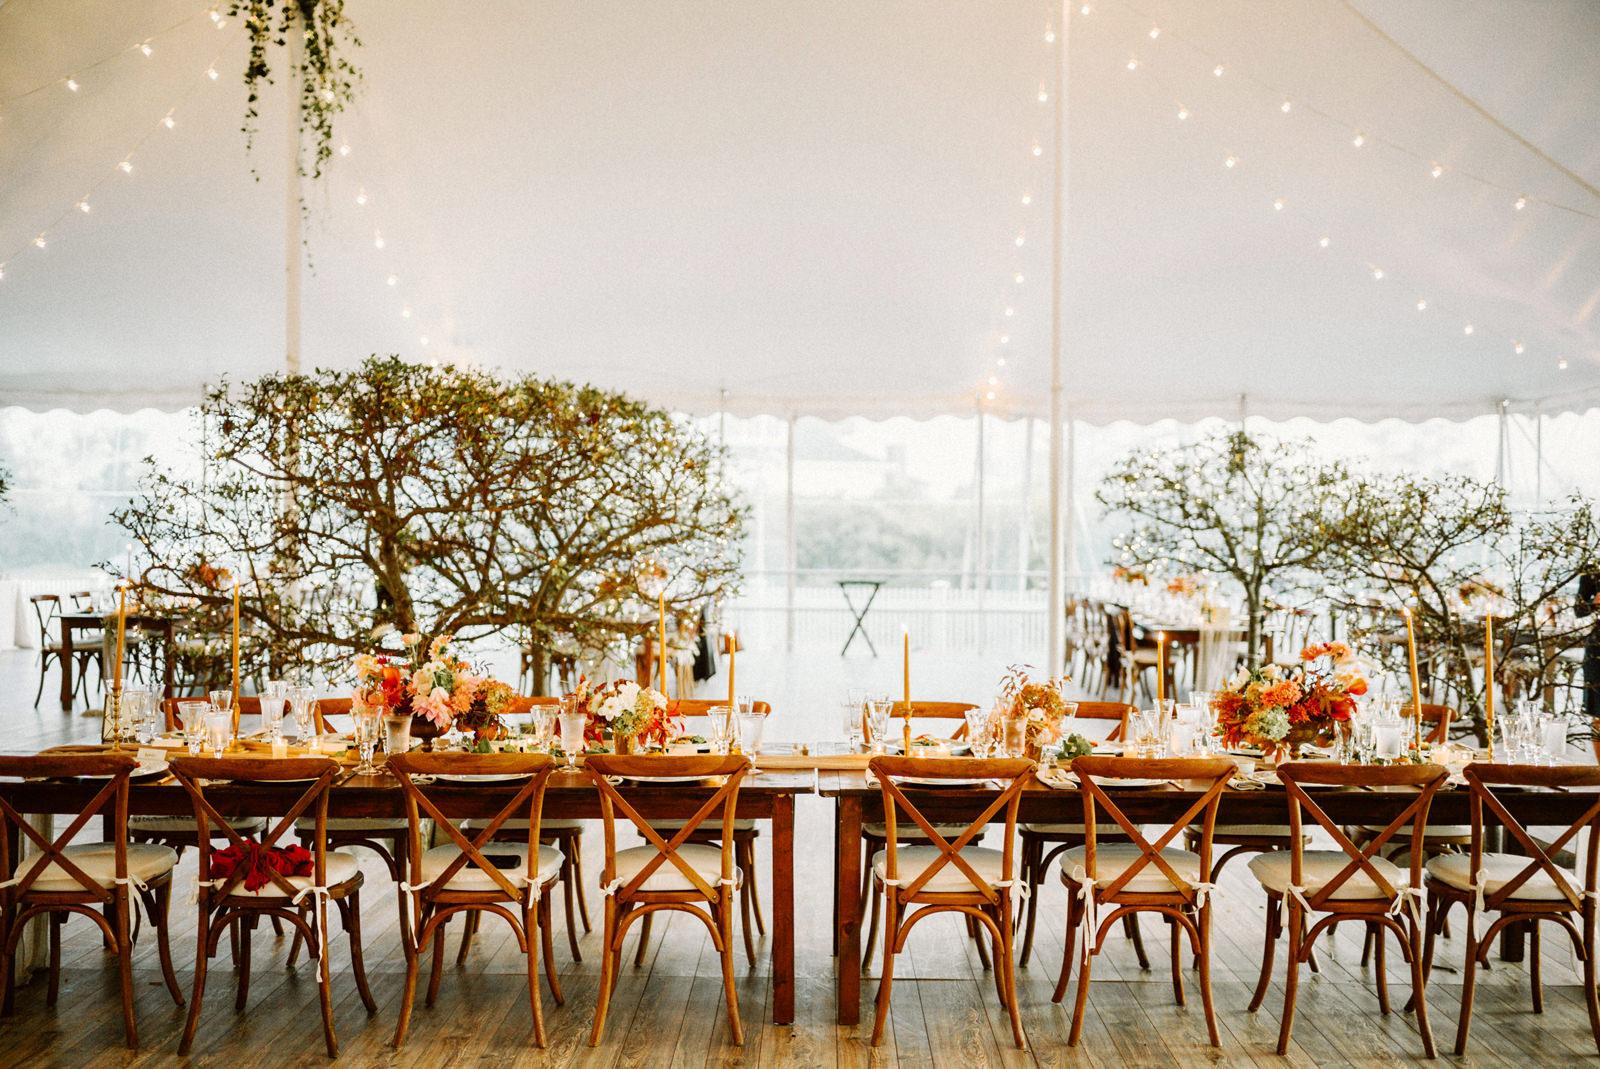 bridgeport-wedding-131 BRIDGEPORT, CONNECTICUT BACKYARD WEDDING